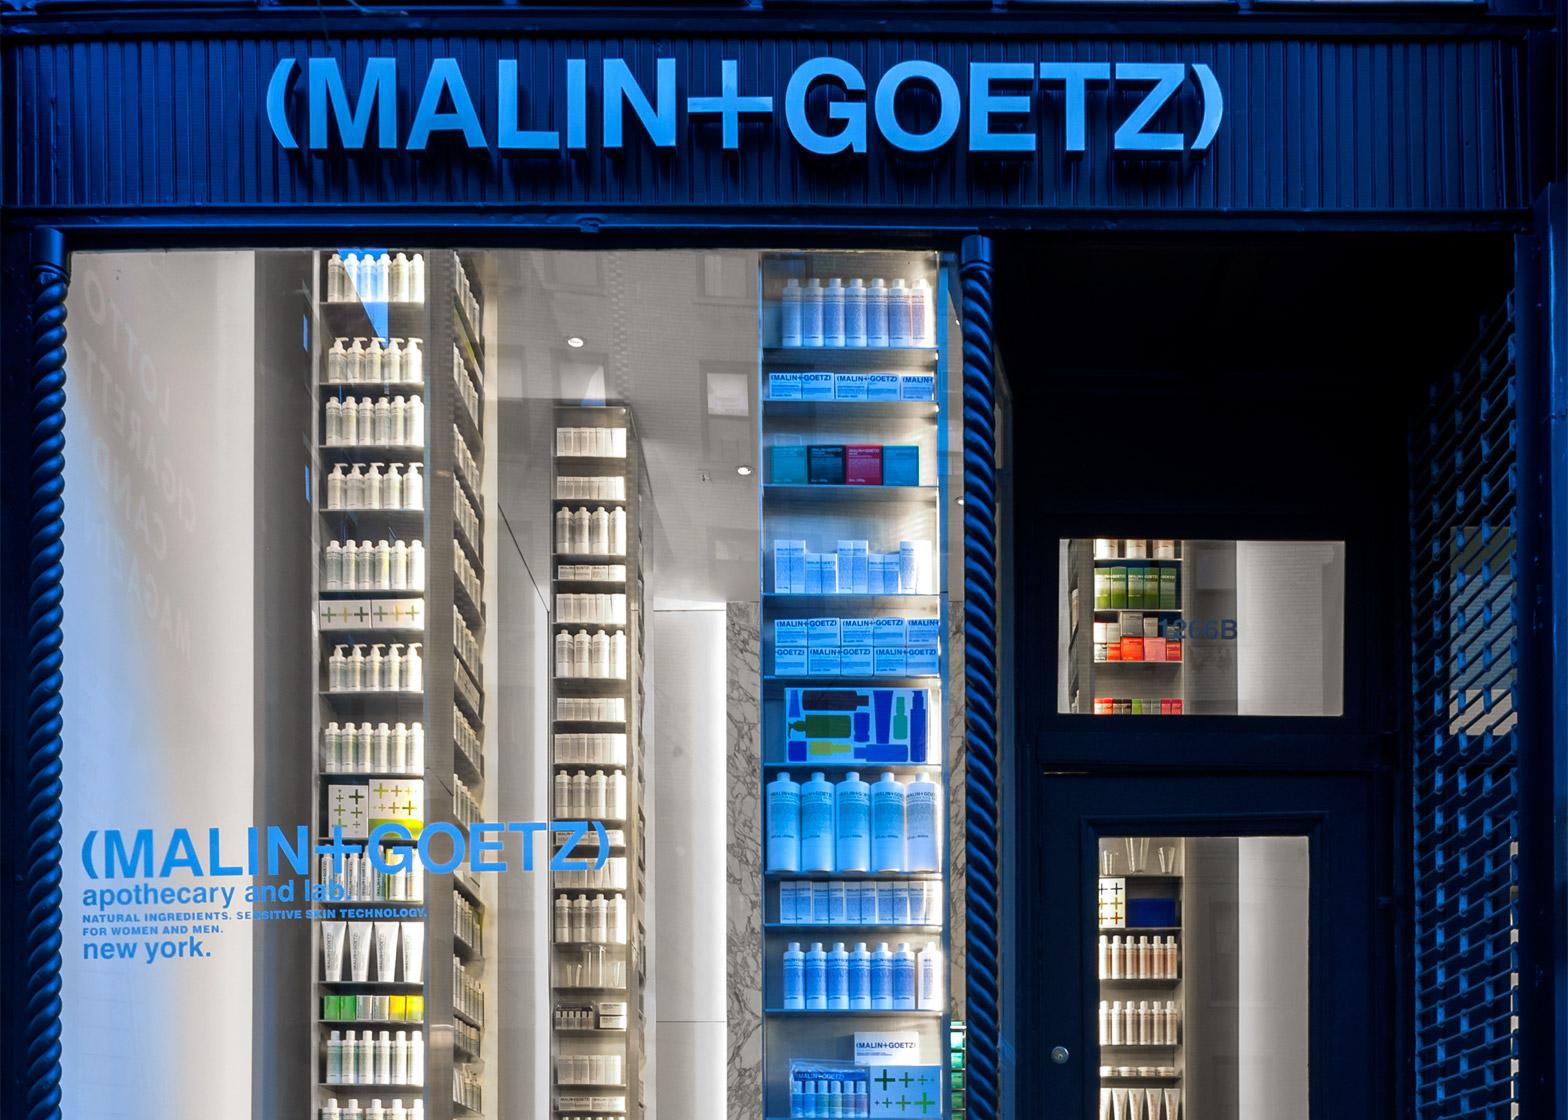 malin-goetz-nyc-messana-ororke_dezeen_1568_3